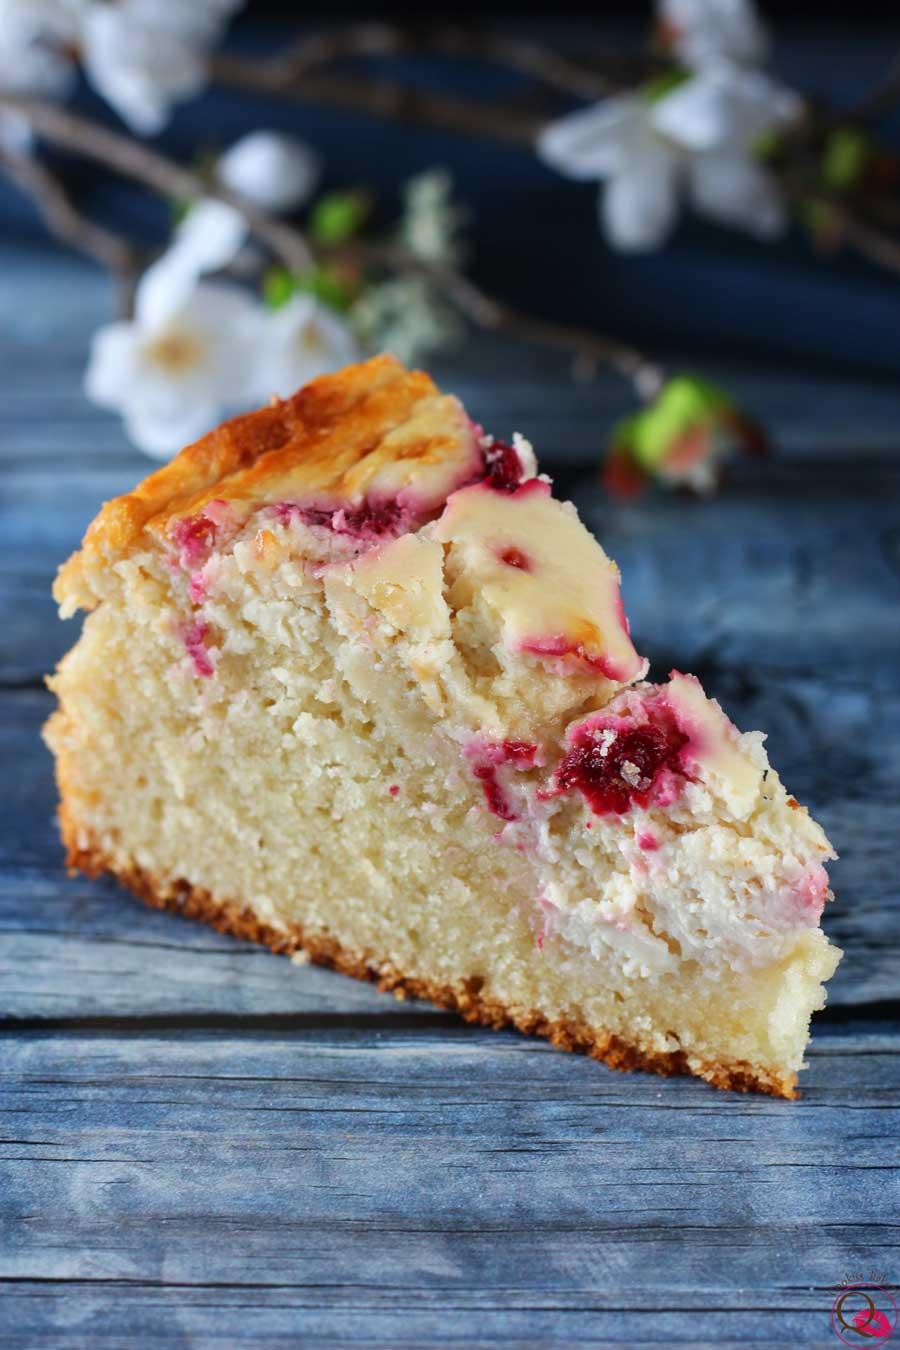 torta 2 in 1 cheesecake e torta allo yogurt